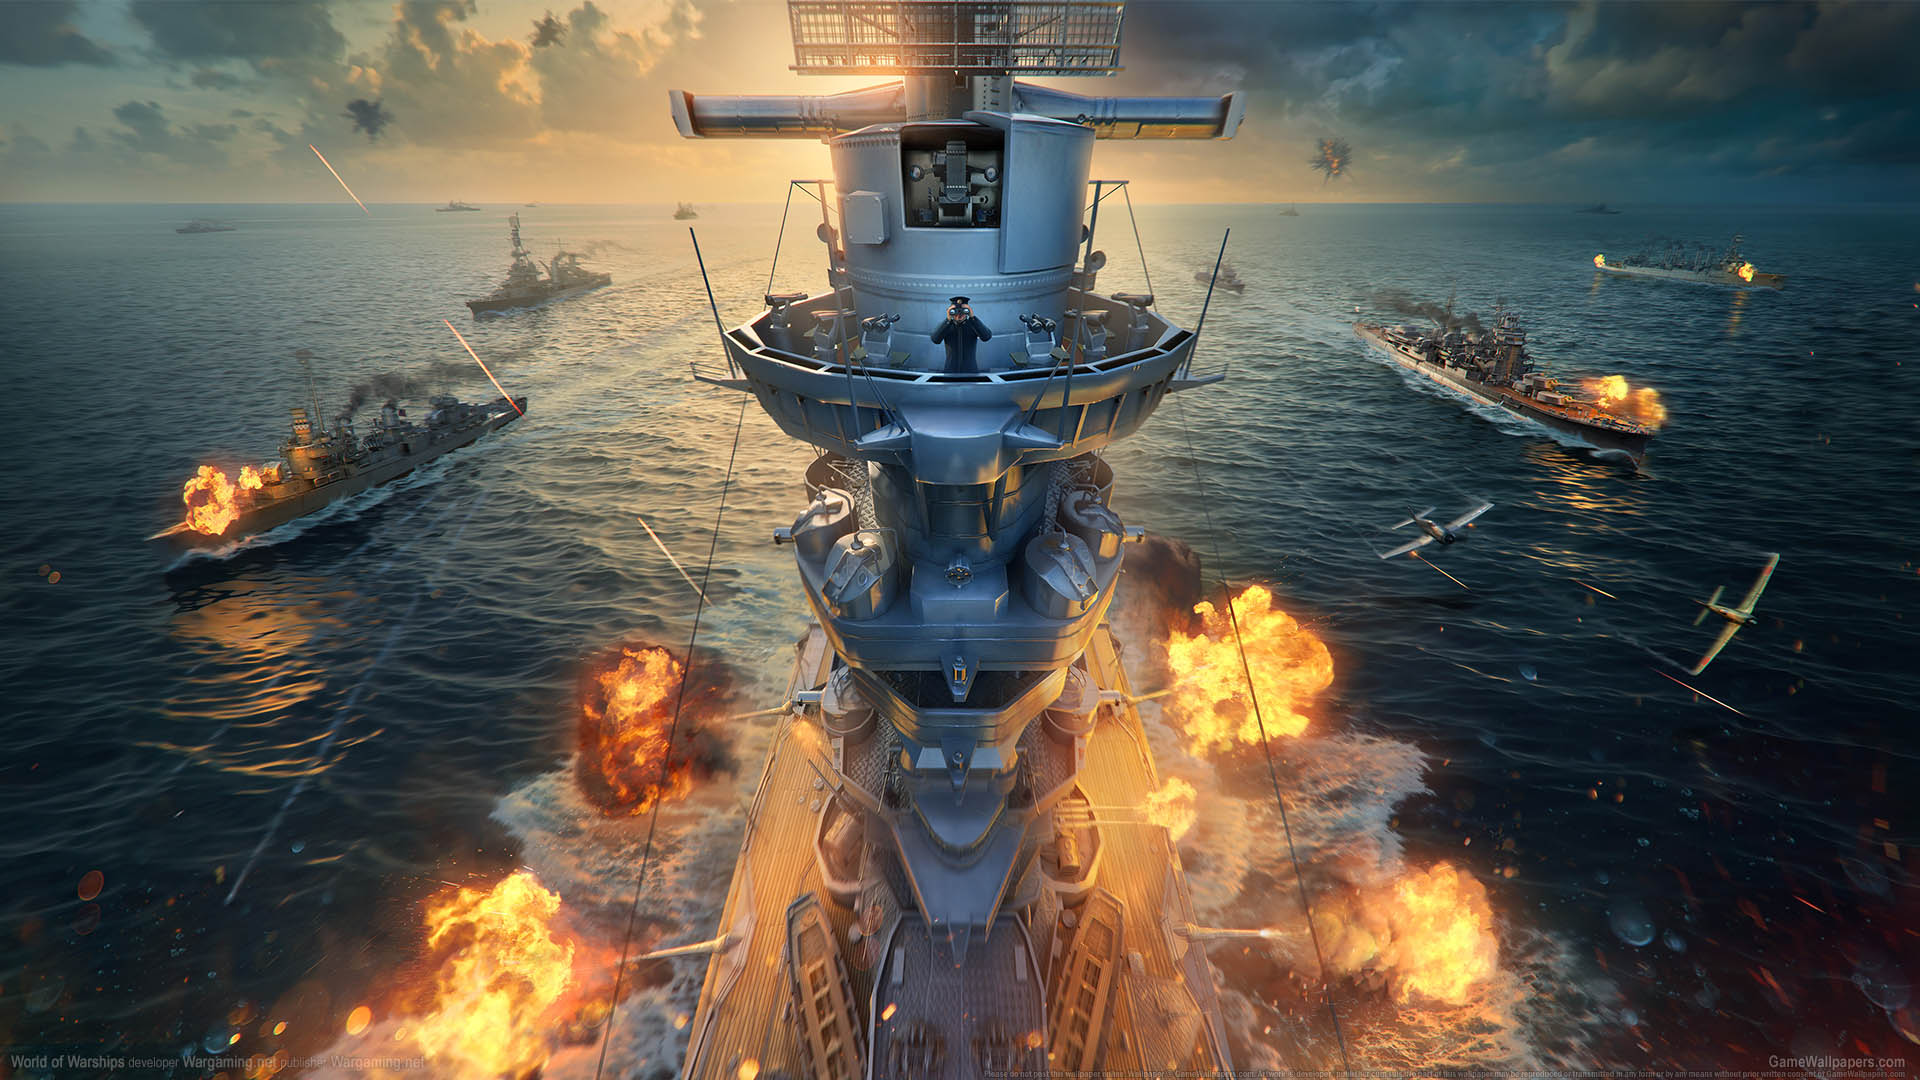 World of Warships fond d'écran 23 1920x1080